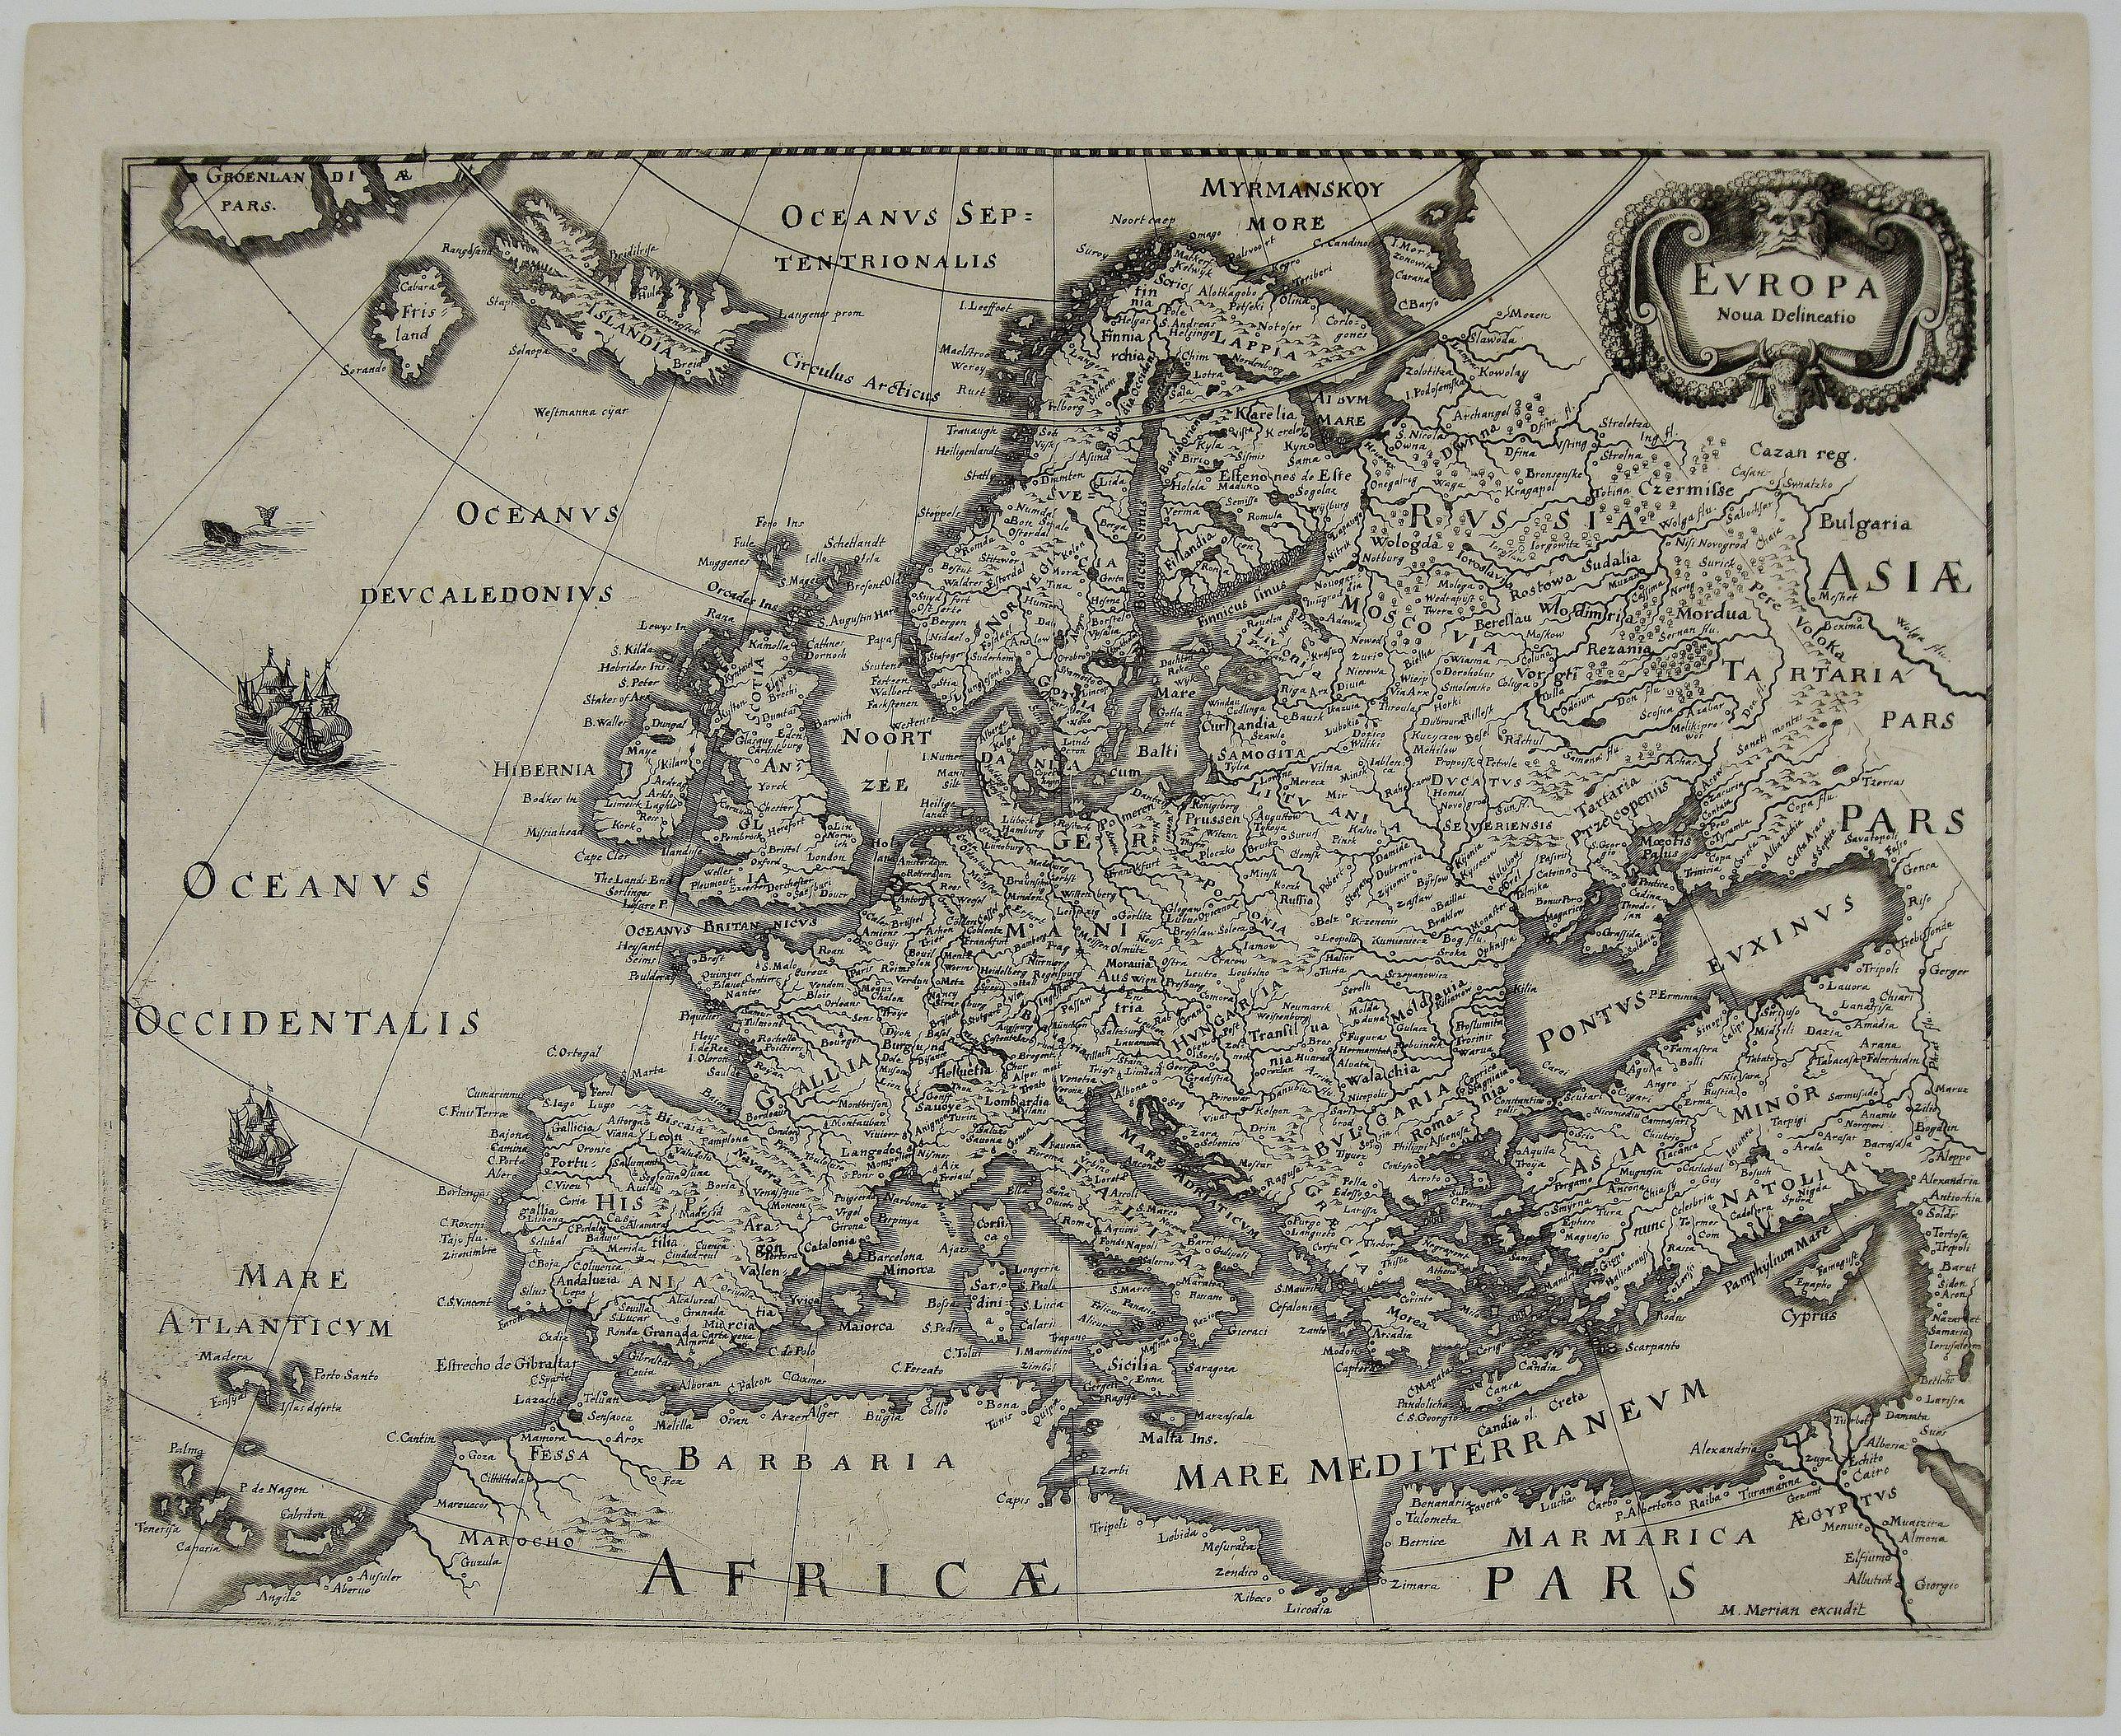 MERIAN, M. - Europa Nova Delineatio.